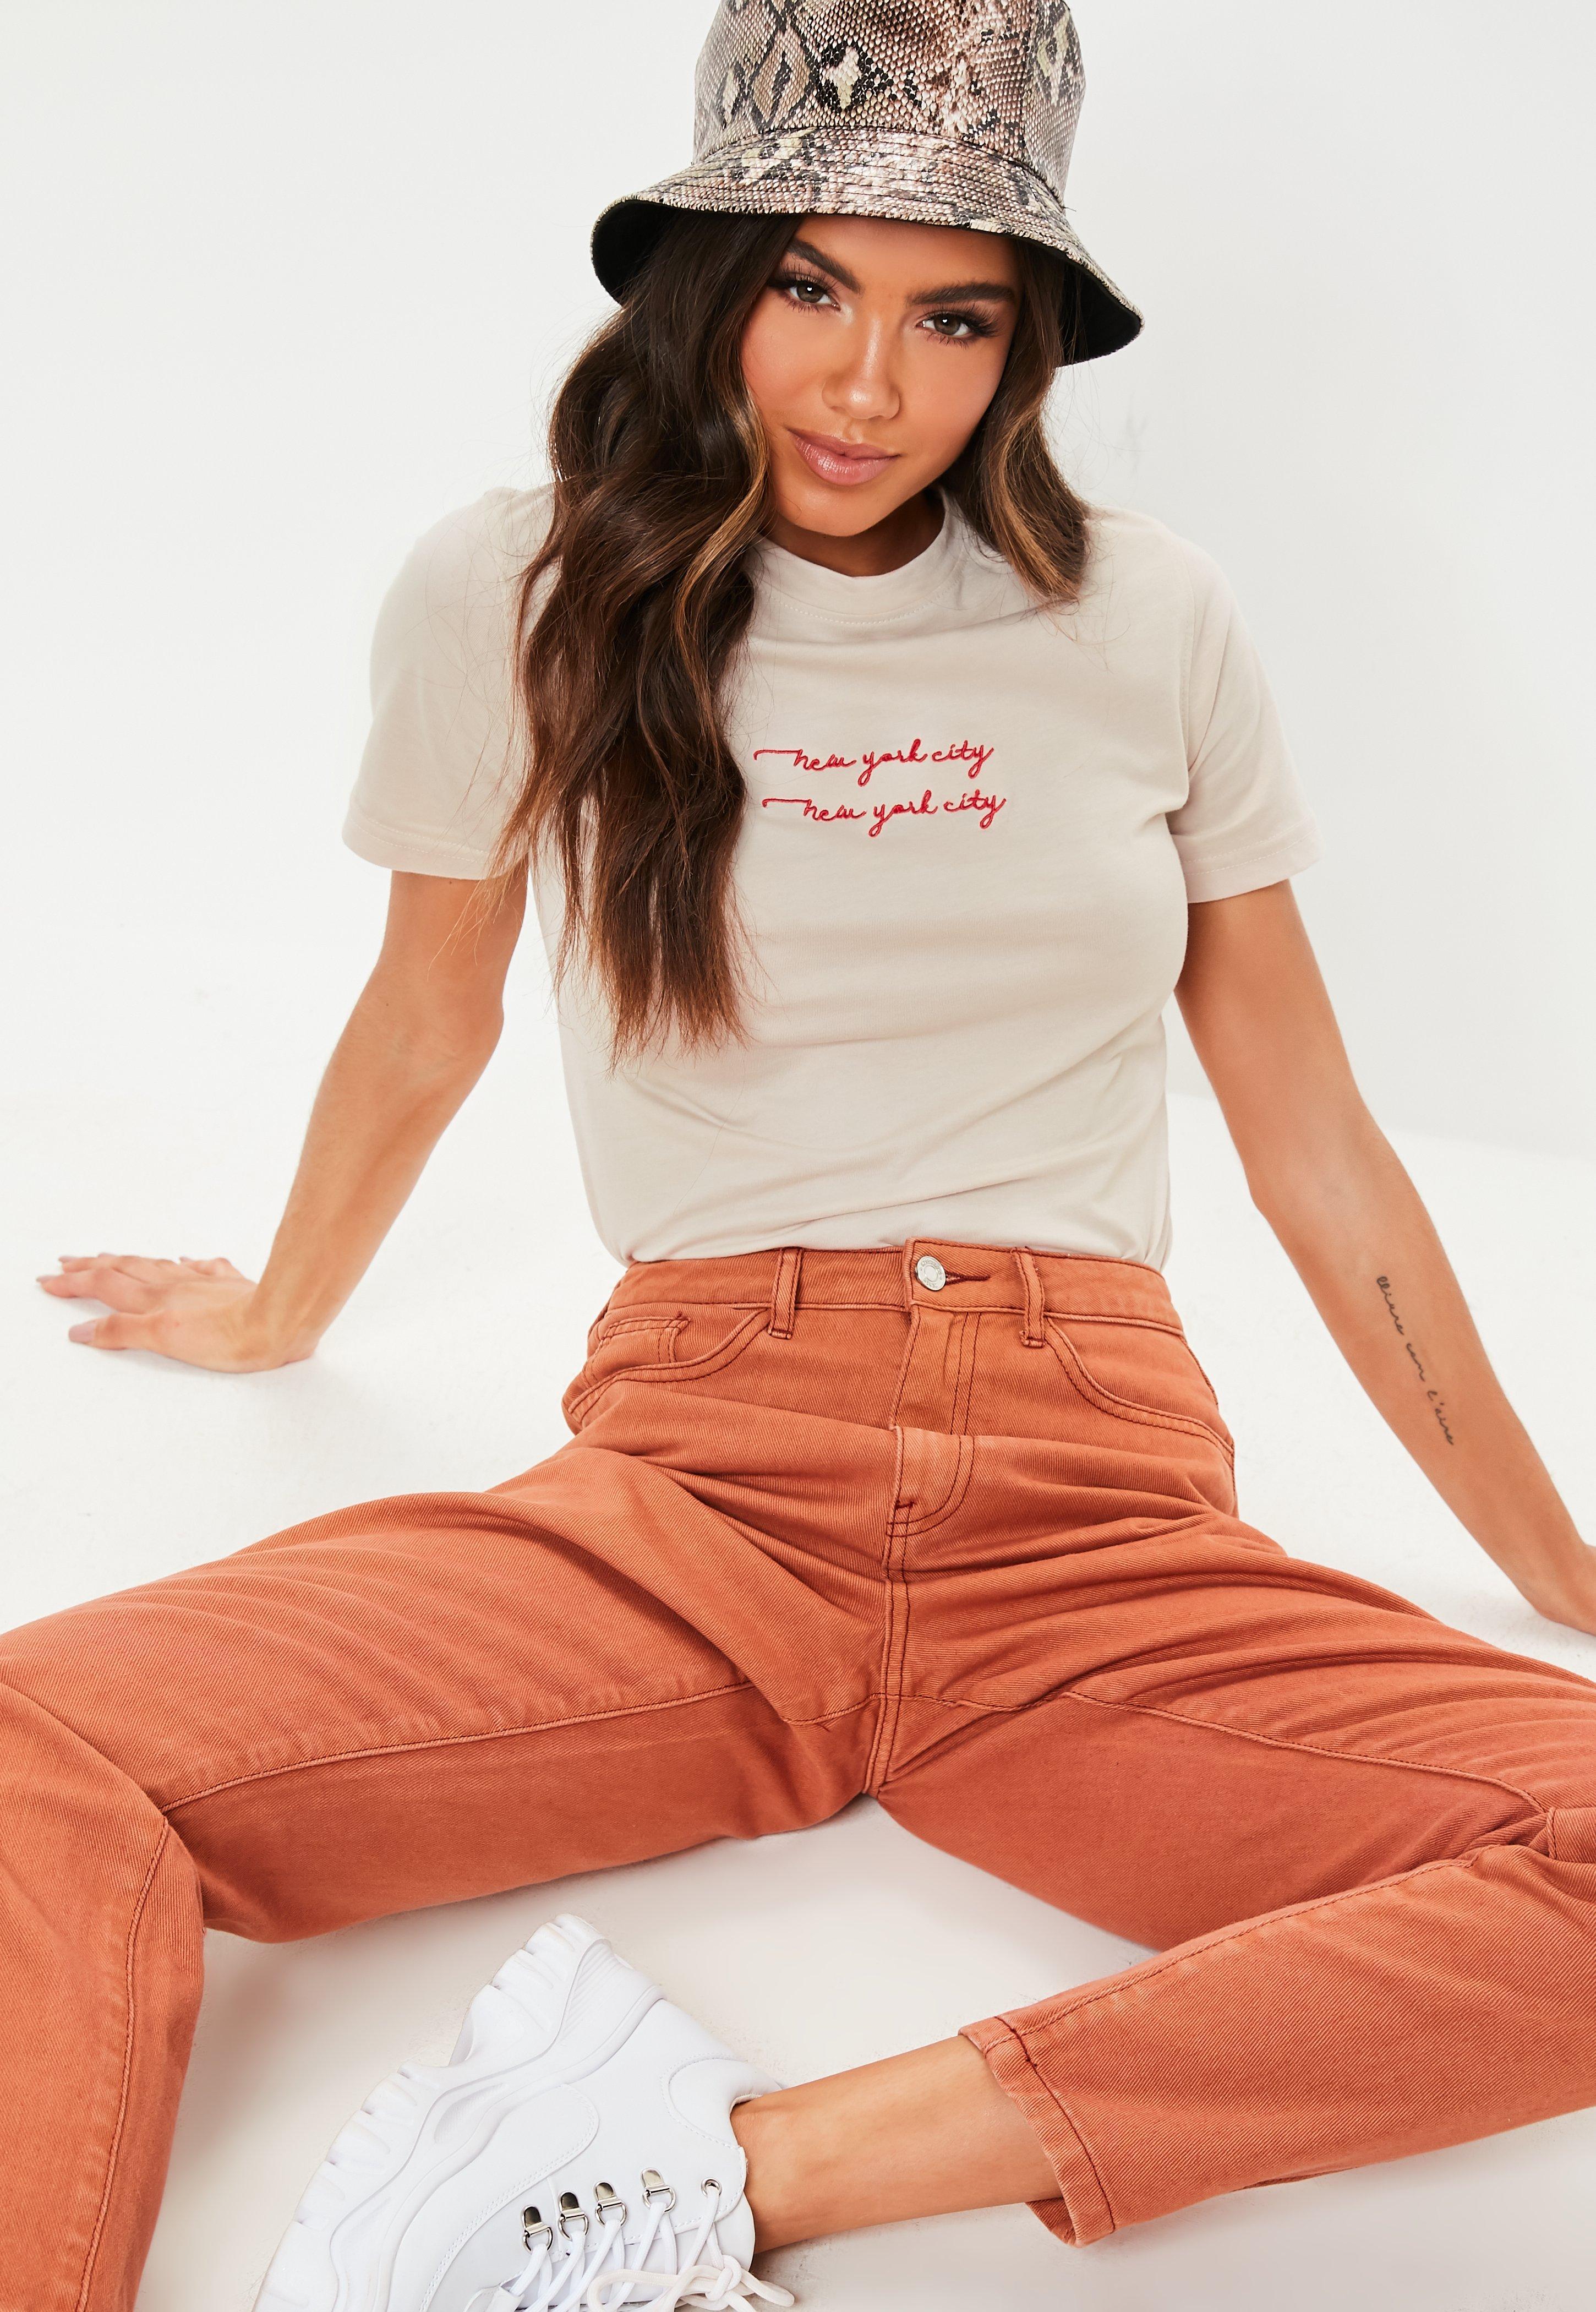 Slogan T-Shirts  45559adc58f7